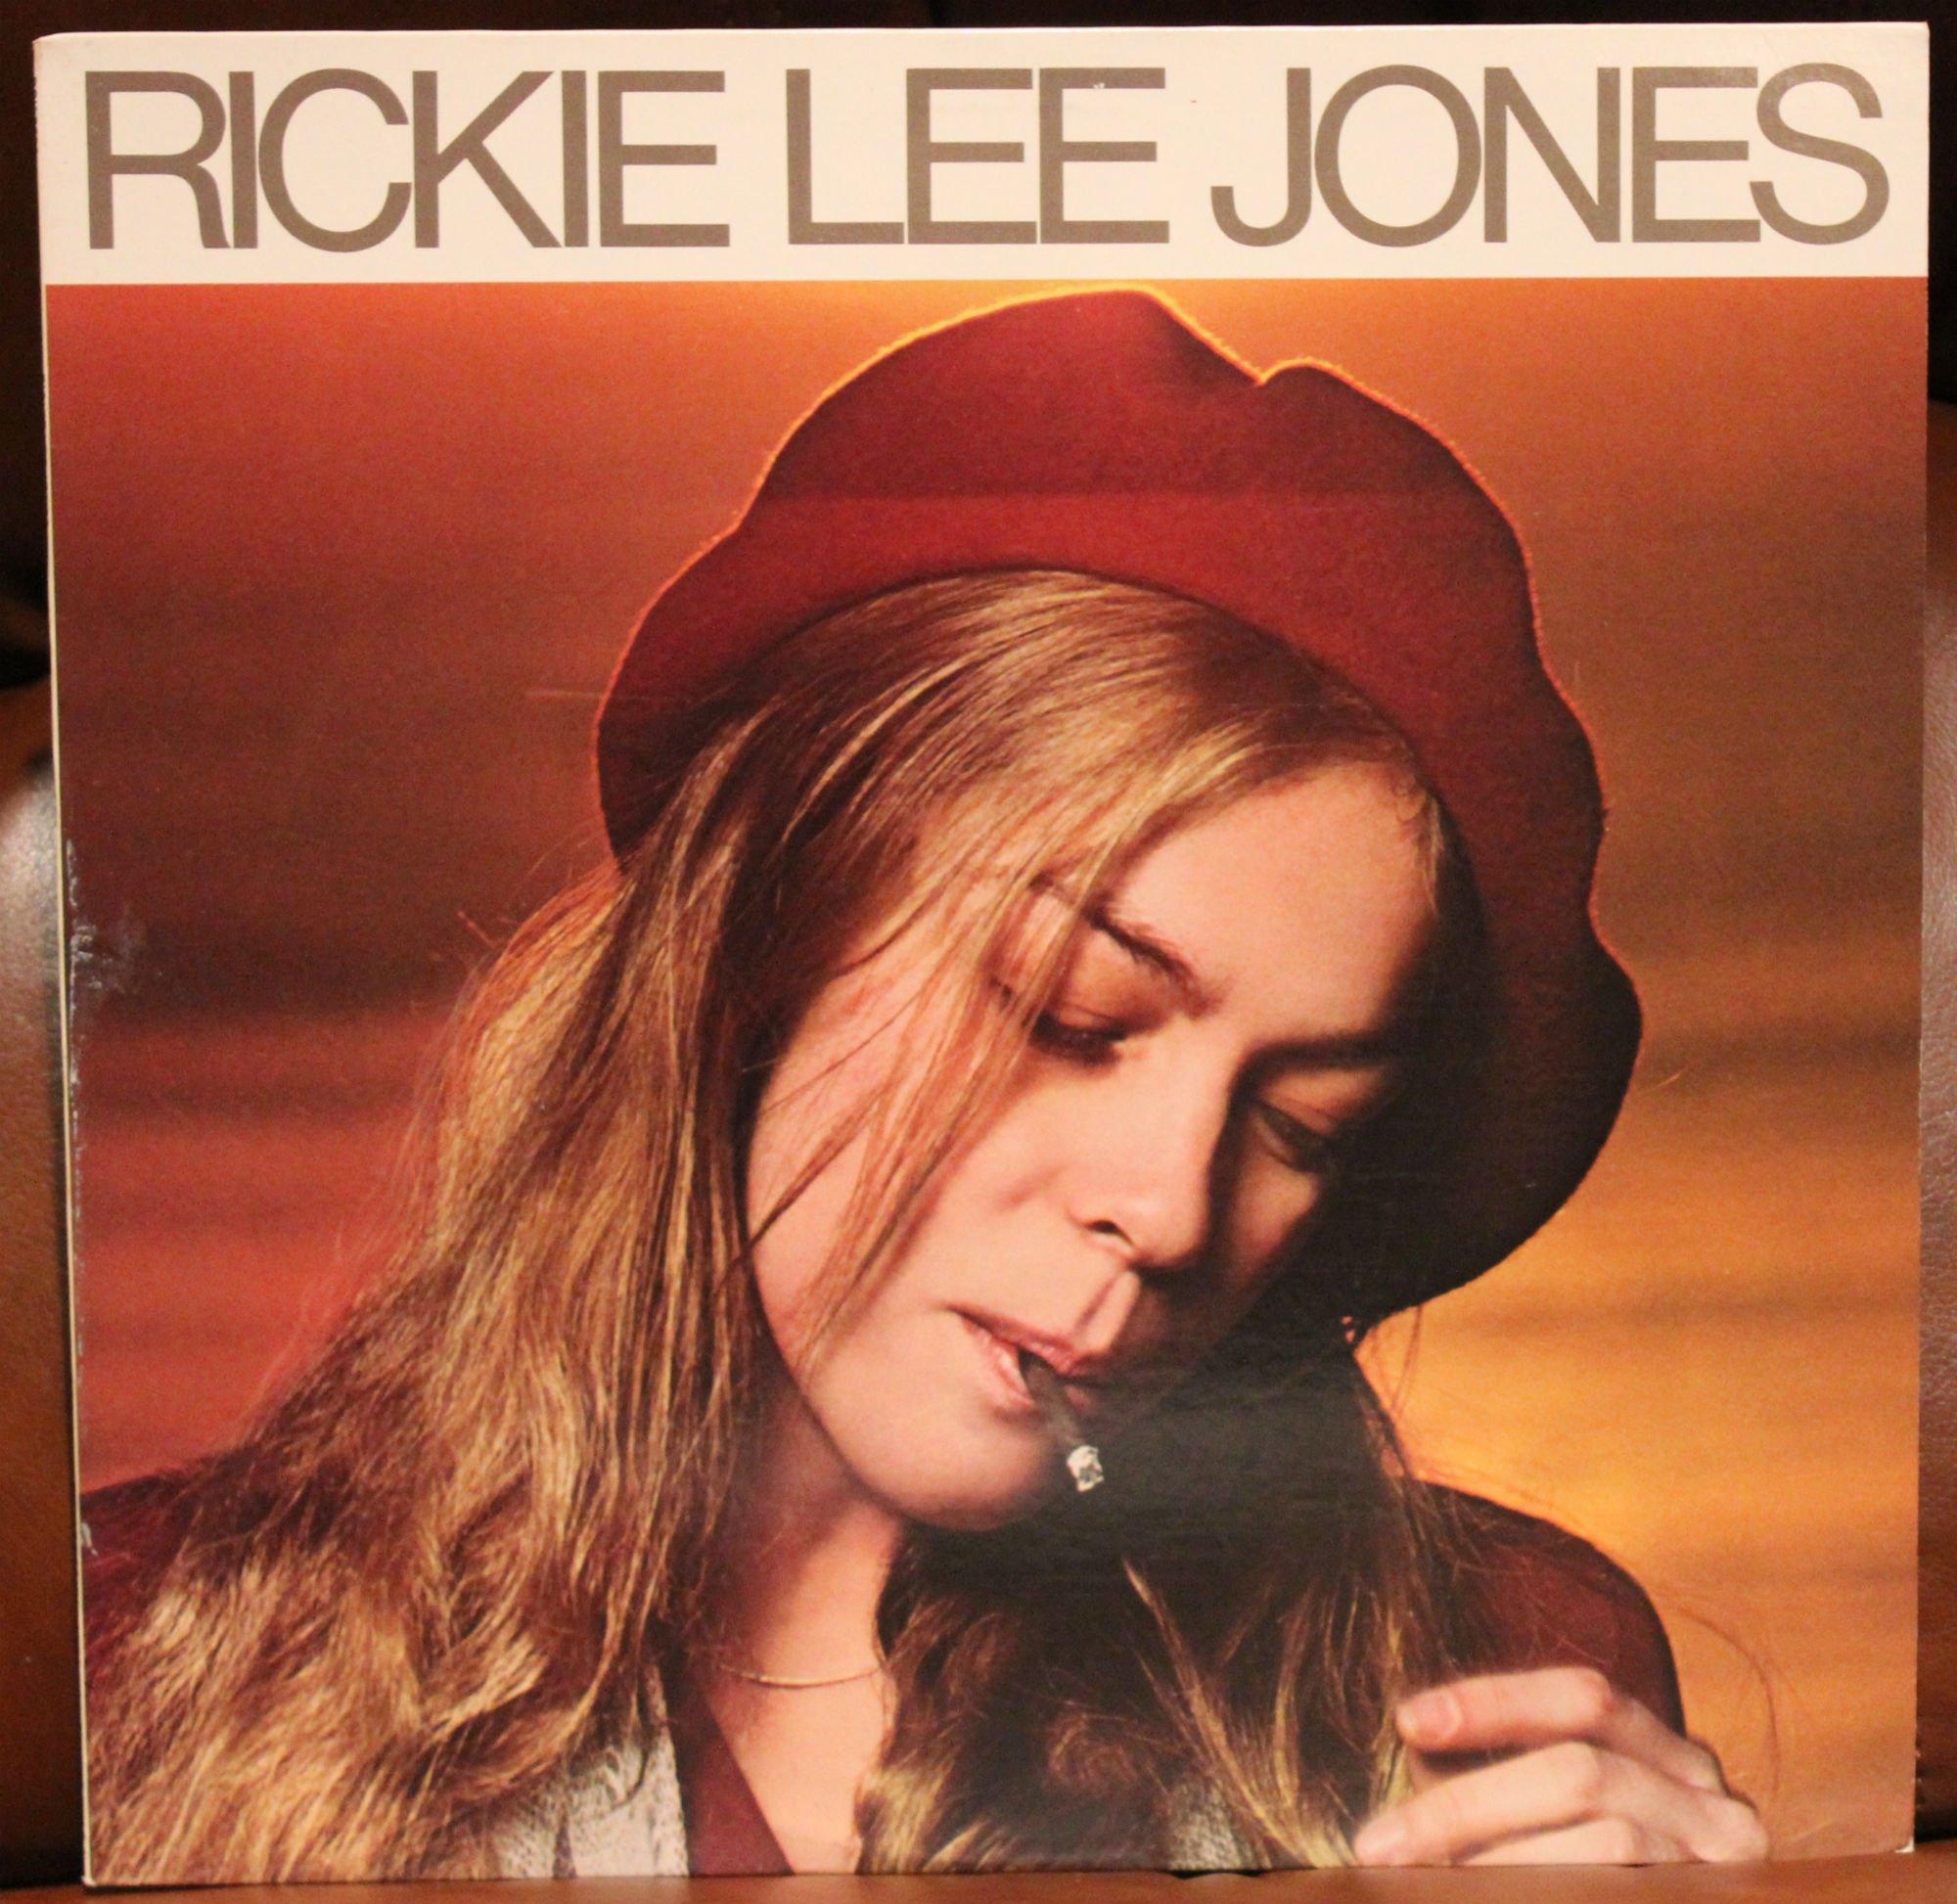 Happy Birthday to Rickie Lee Jones 63 and Bonnie Raitt  68 today - 2 powerful woman in music